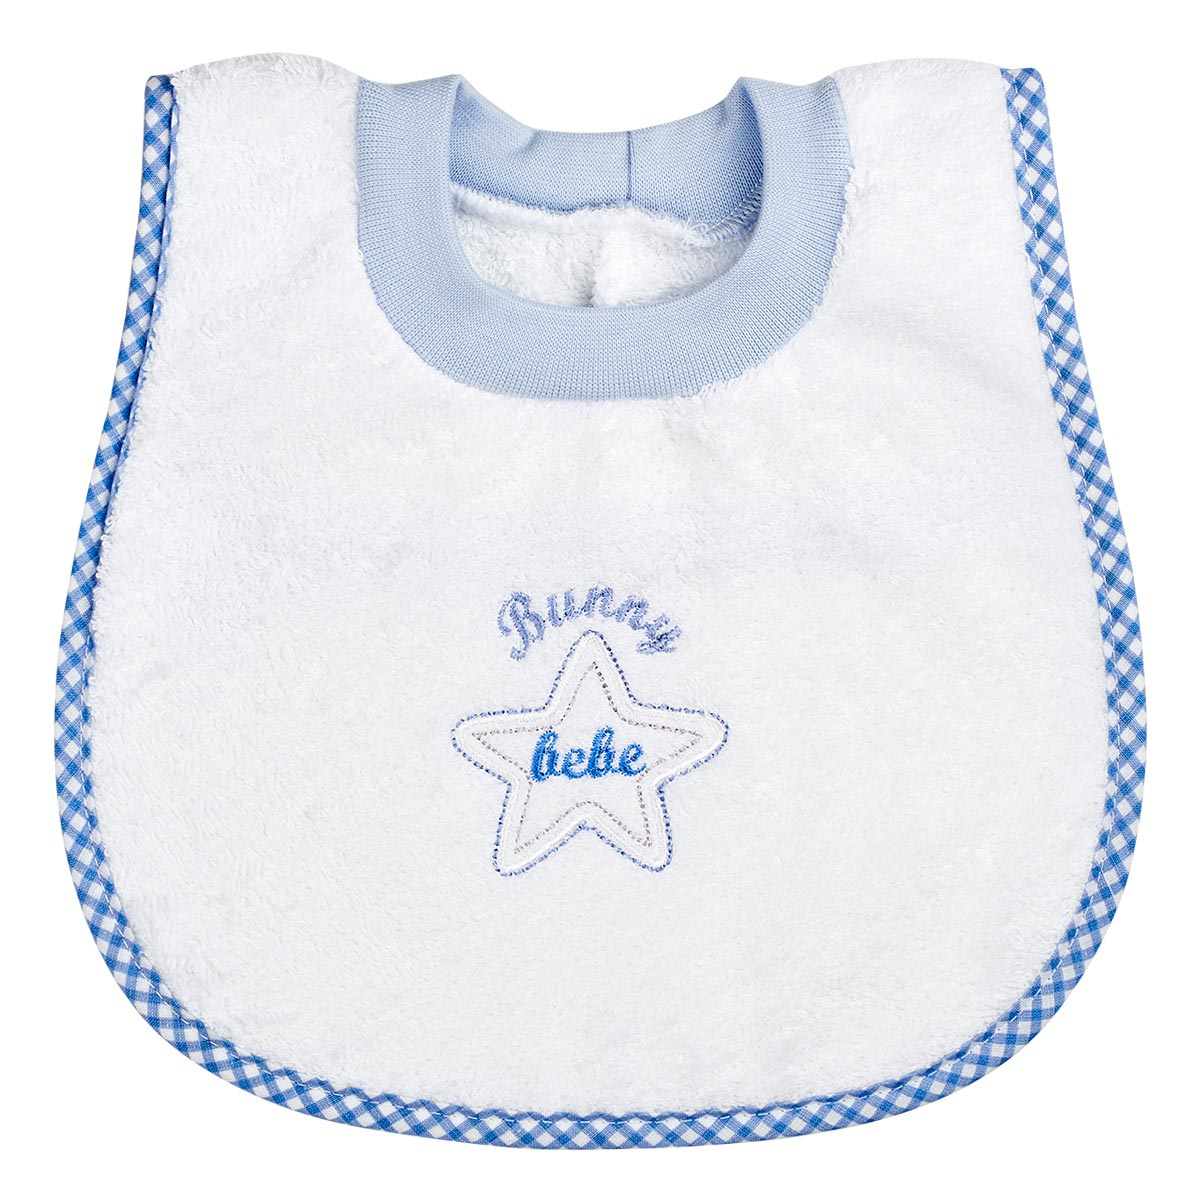 "Bunny bebe σαλιάρα πετσετέ ""ποδίτσα"" αστεράκι μπλε"